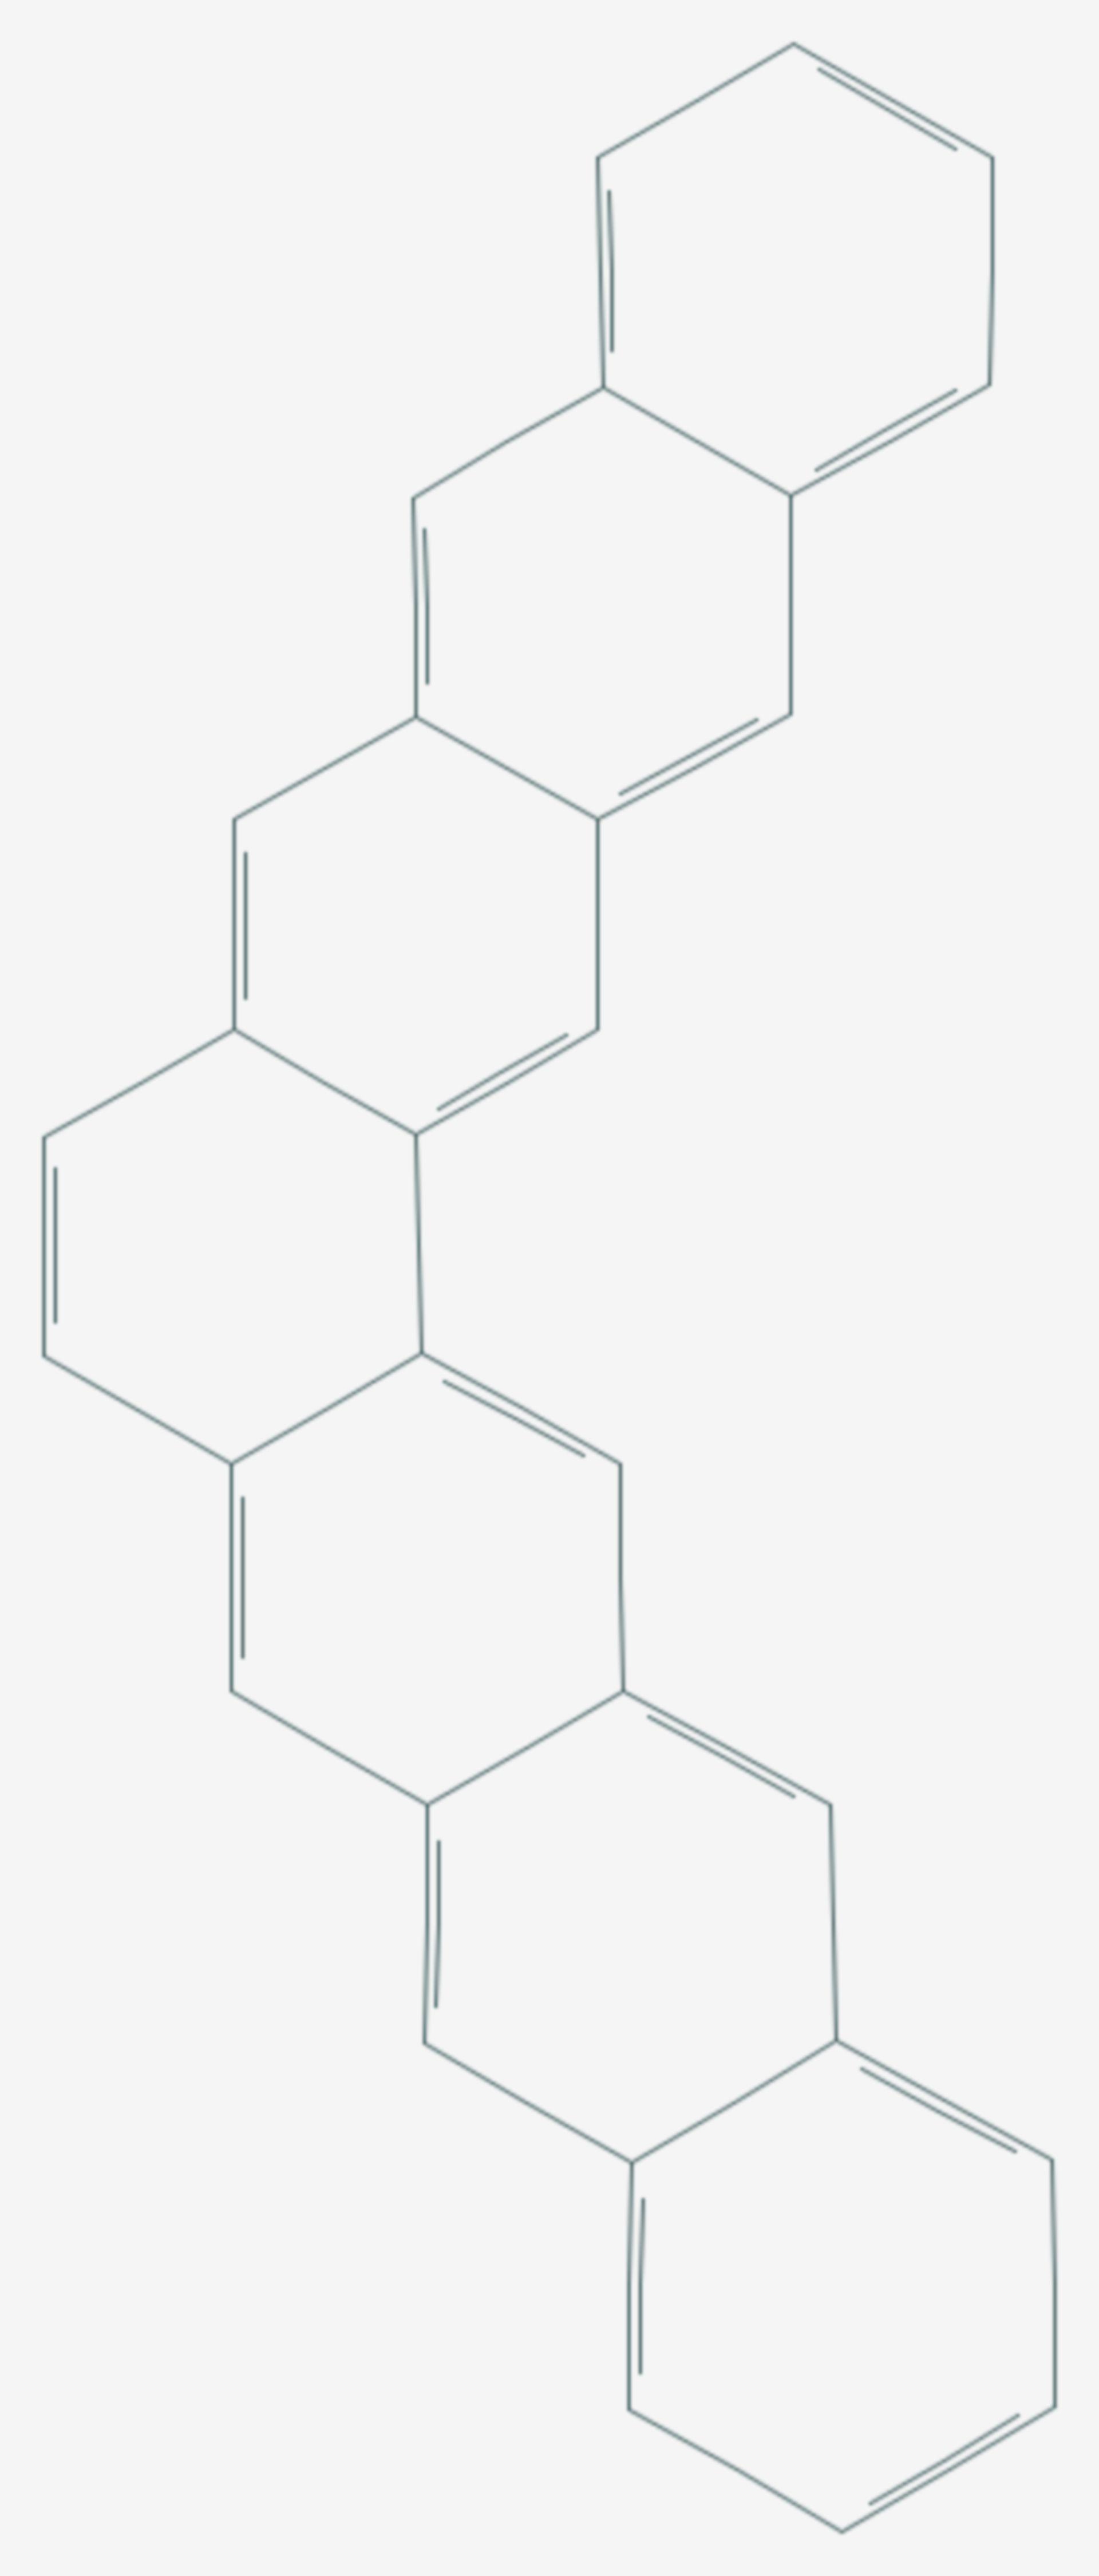 Heptaphen (Strukturformel)